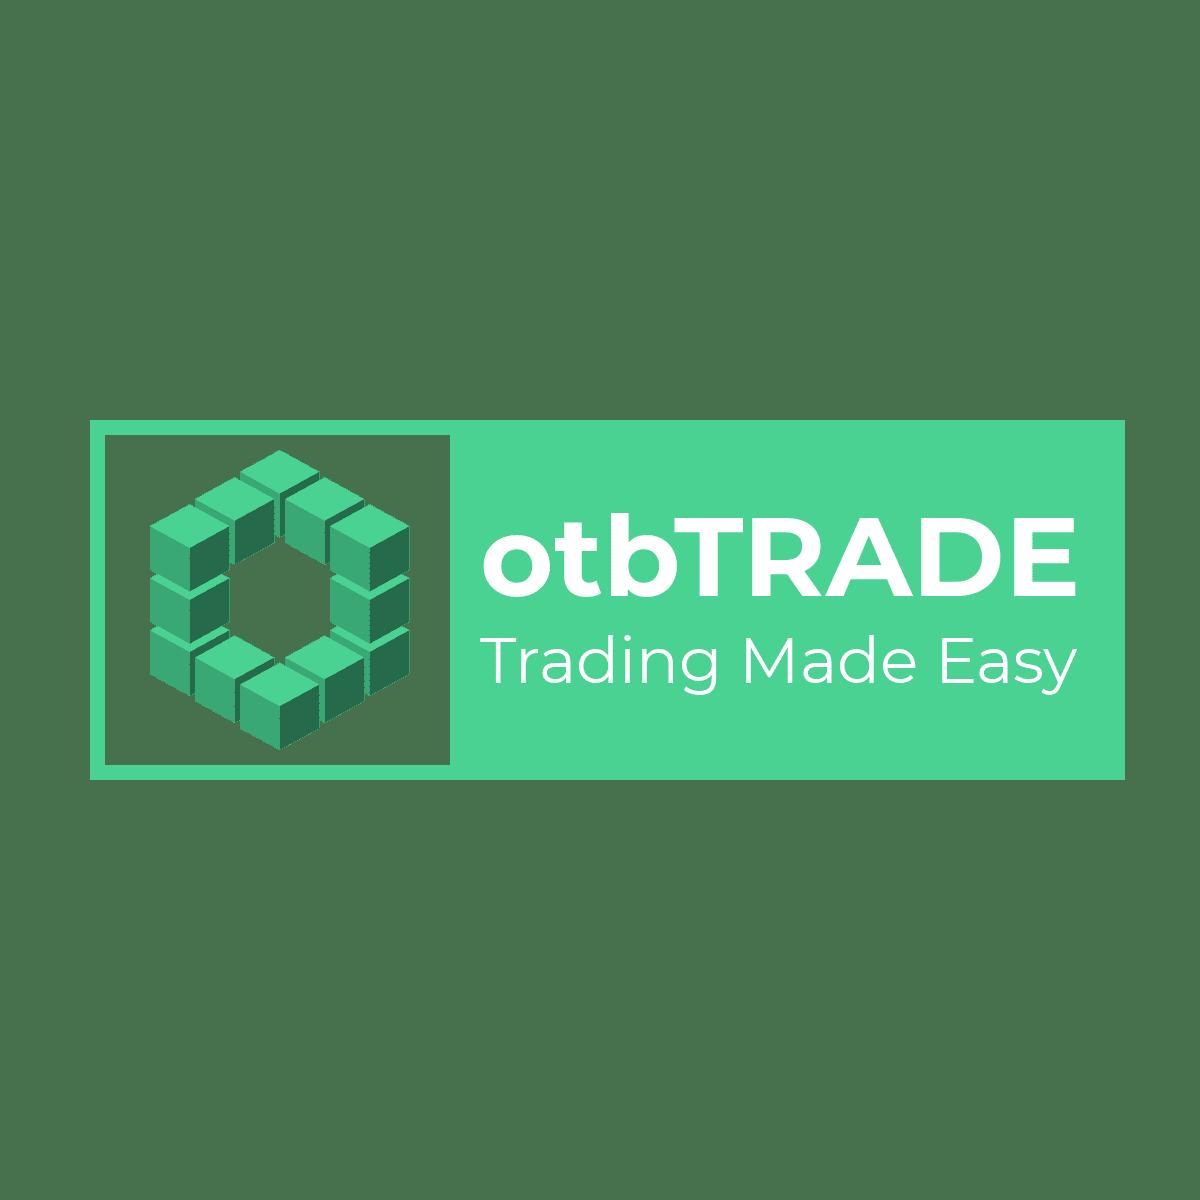 otbTRADE logo